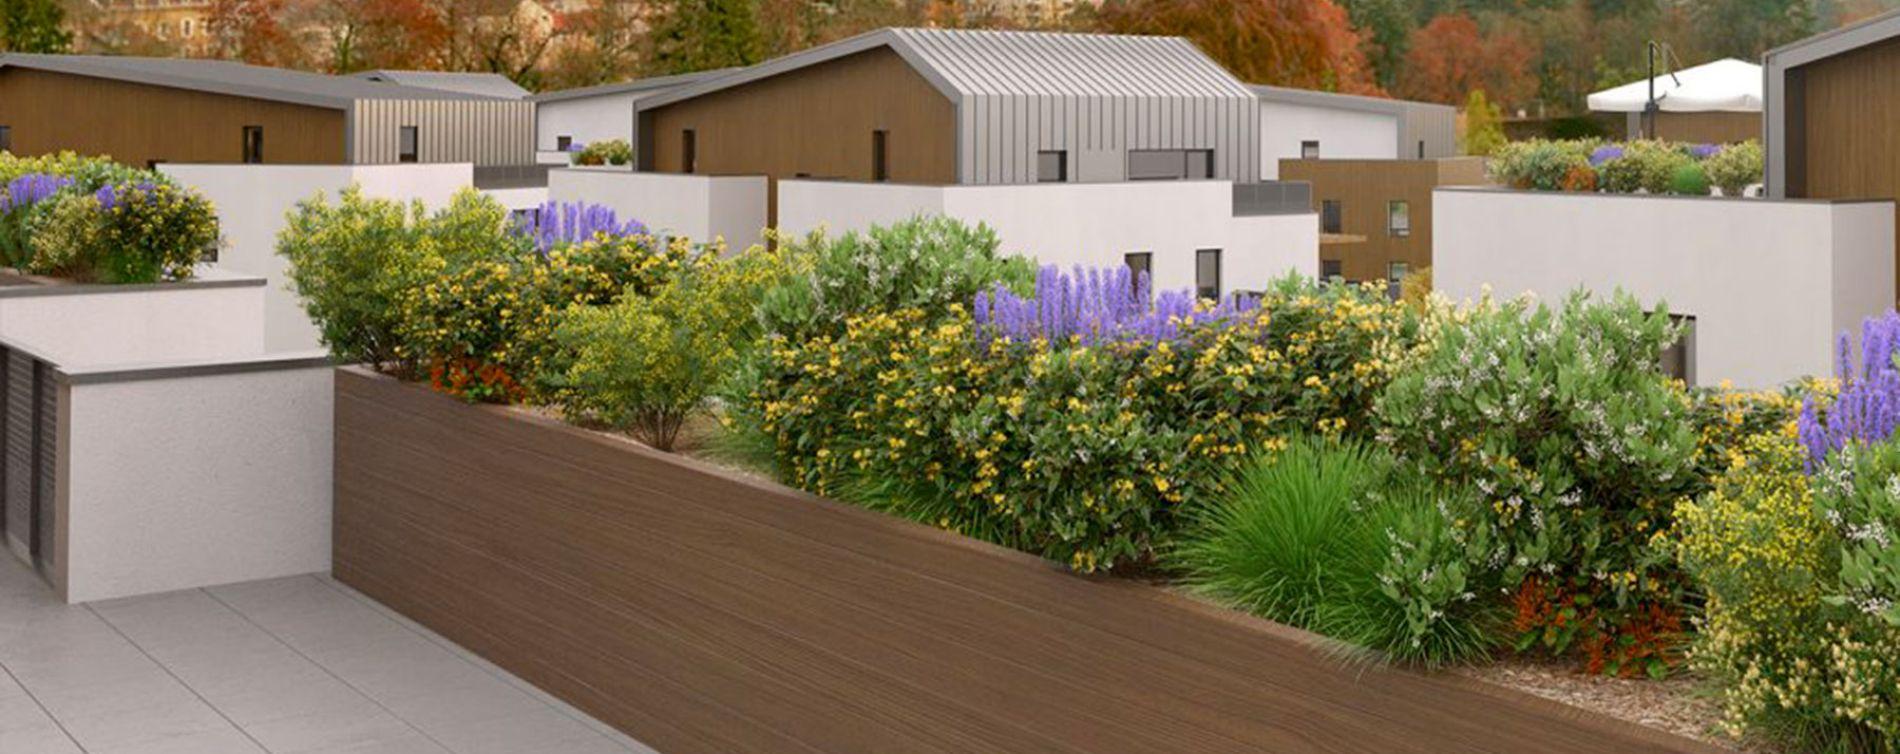 Gex : programme immobilier neuve « Terres Harmonie » (3)